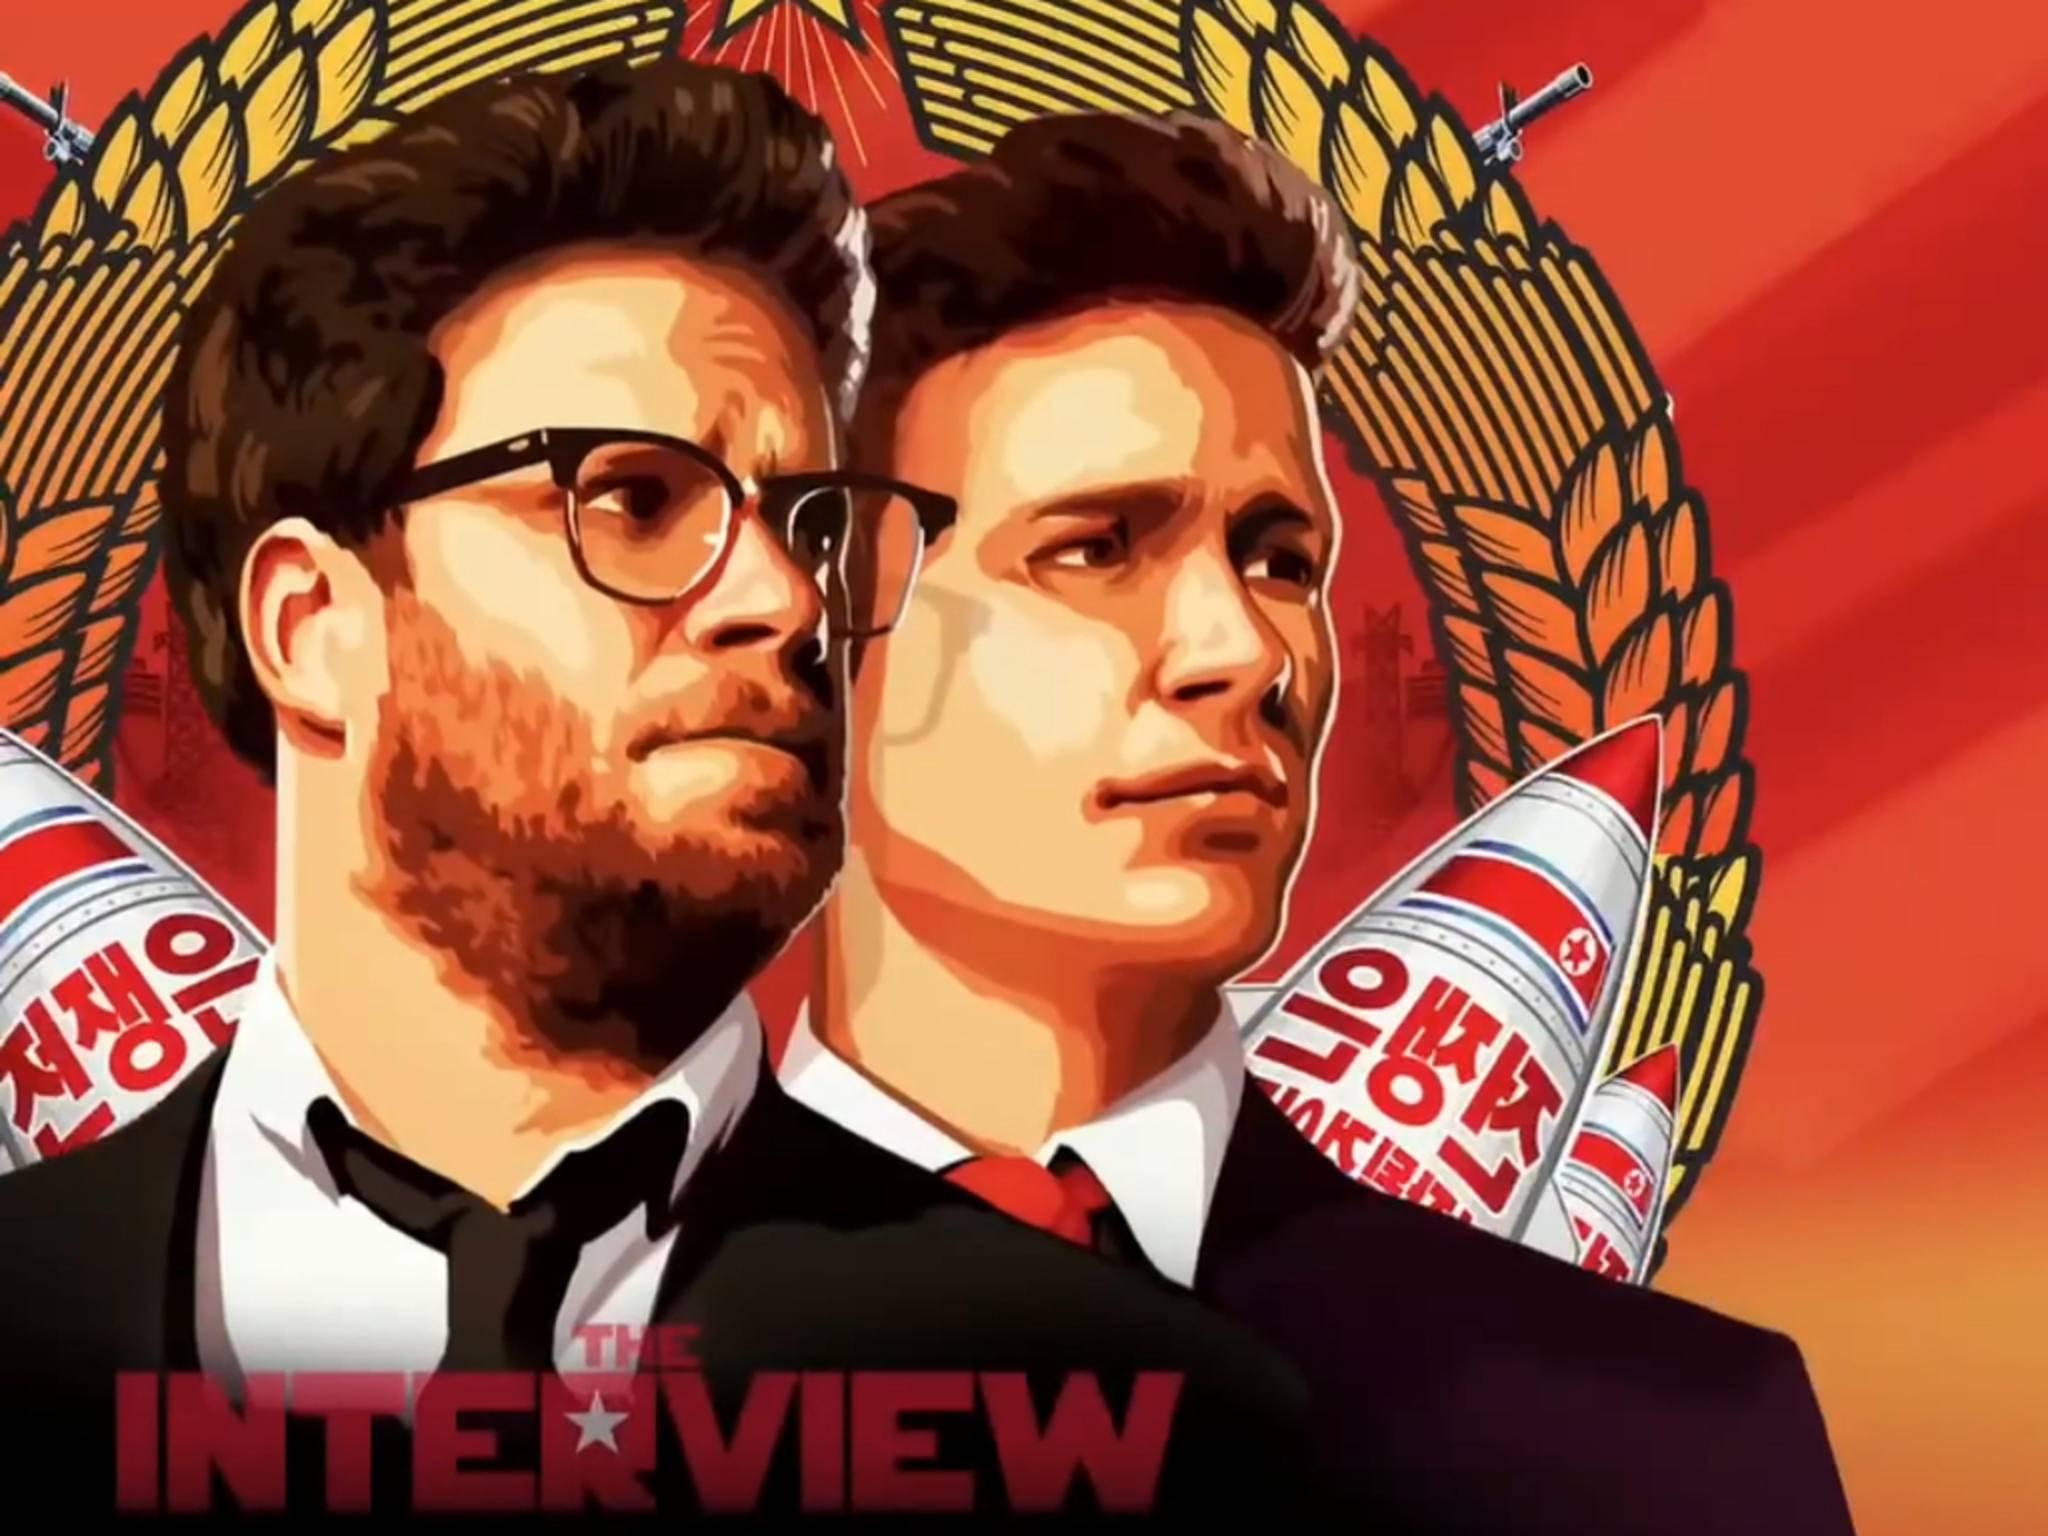 """The Interview"" wird seit dem 24. Dezember offiziell im Netz gestreamt."